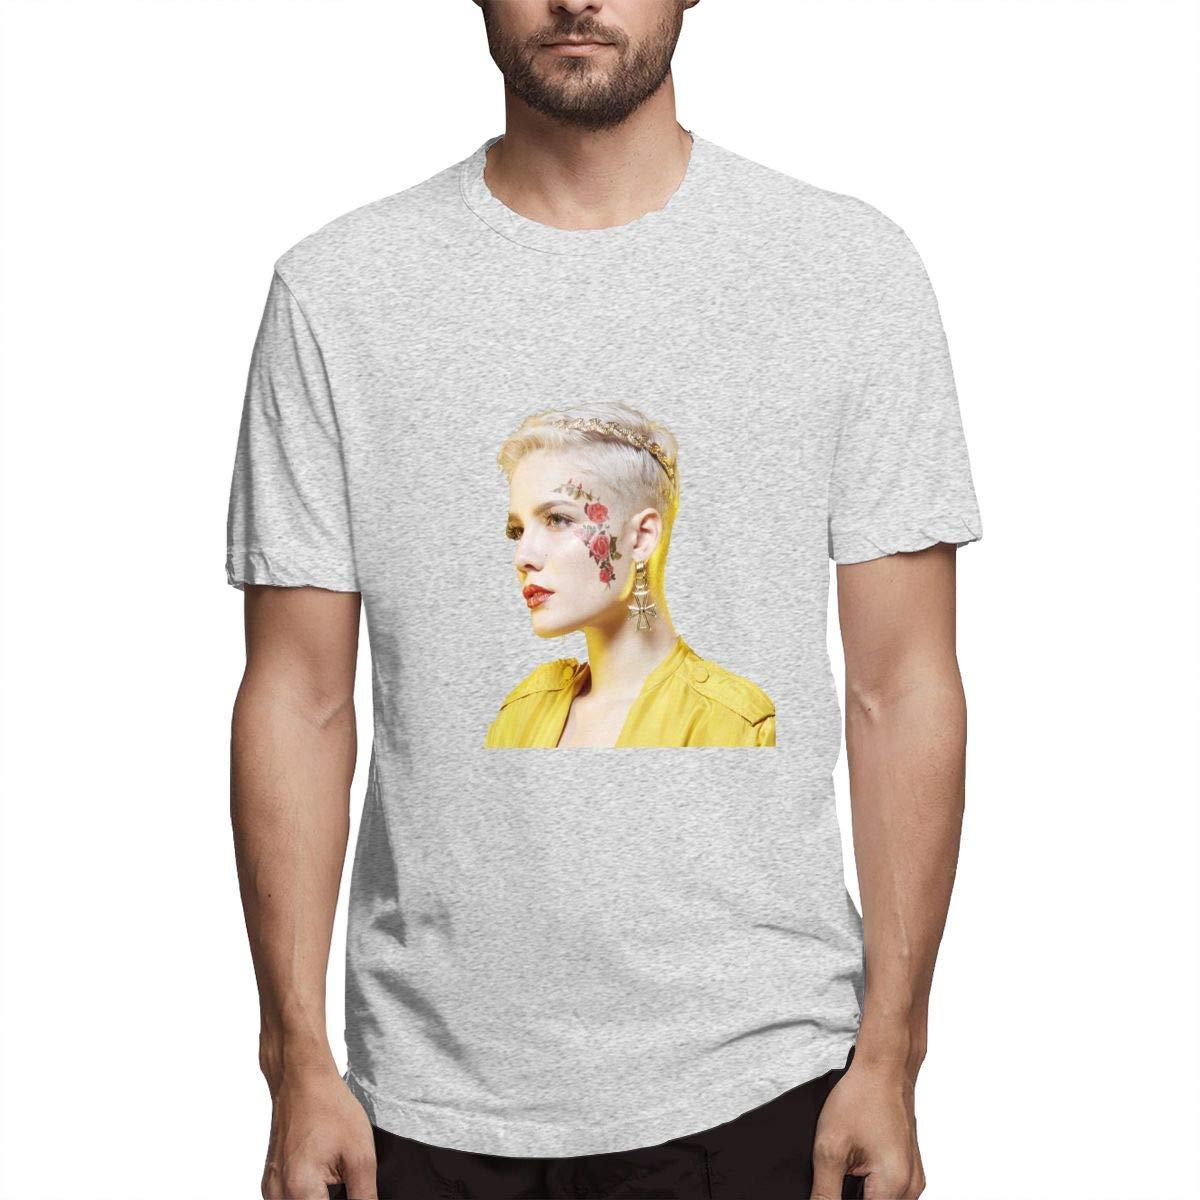 Cybest Halsey Shirt Mens Classic Crop Top Summer Dew Navel for Unisex